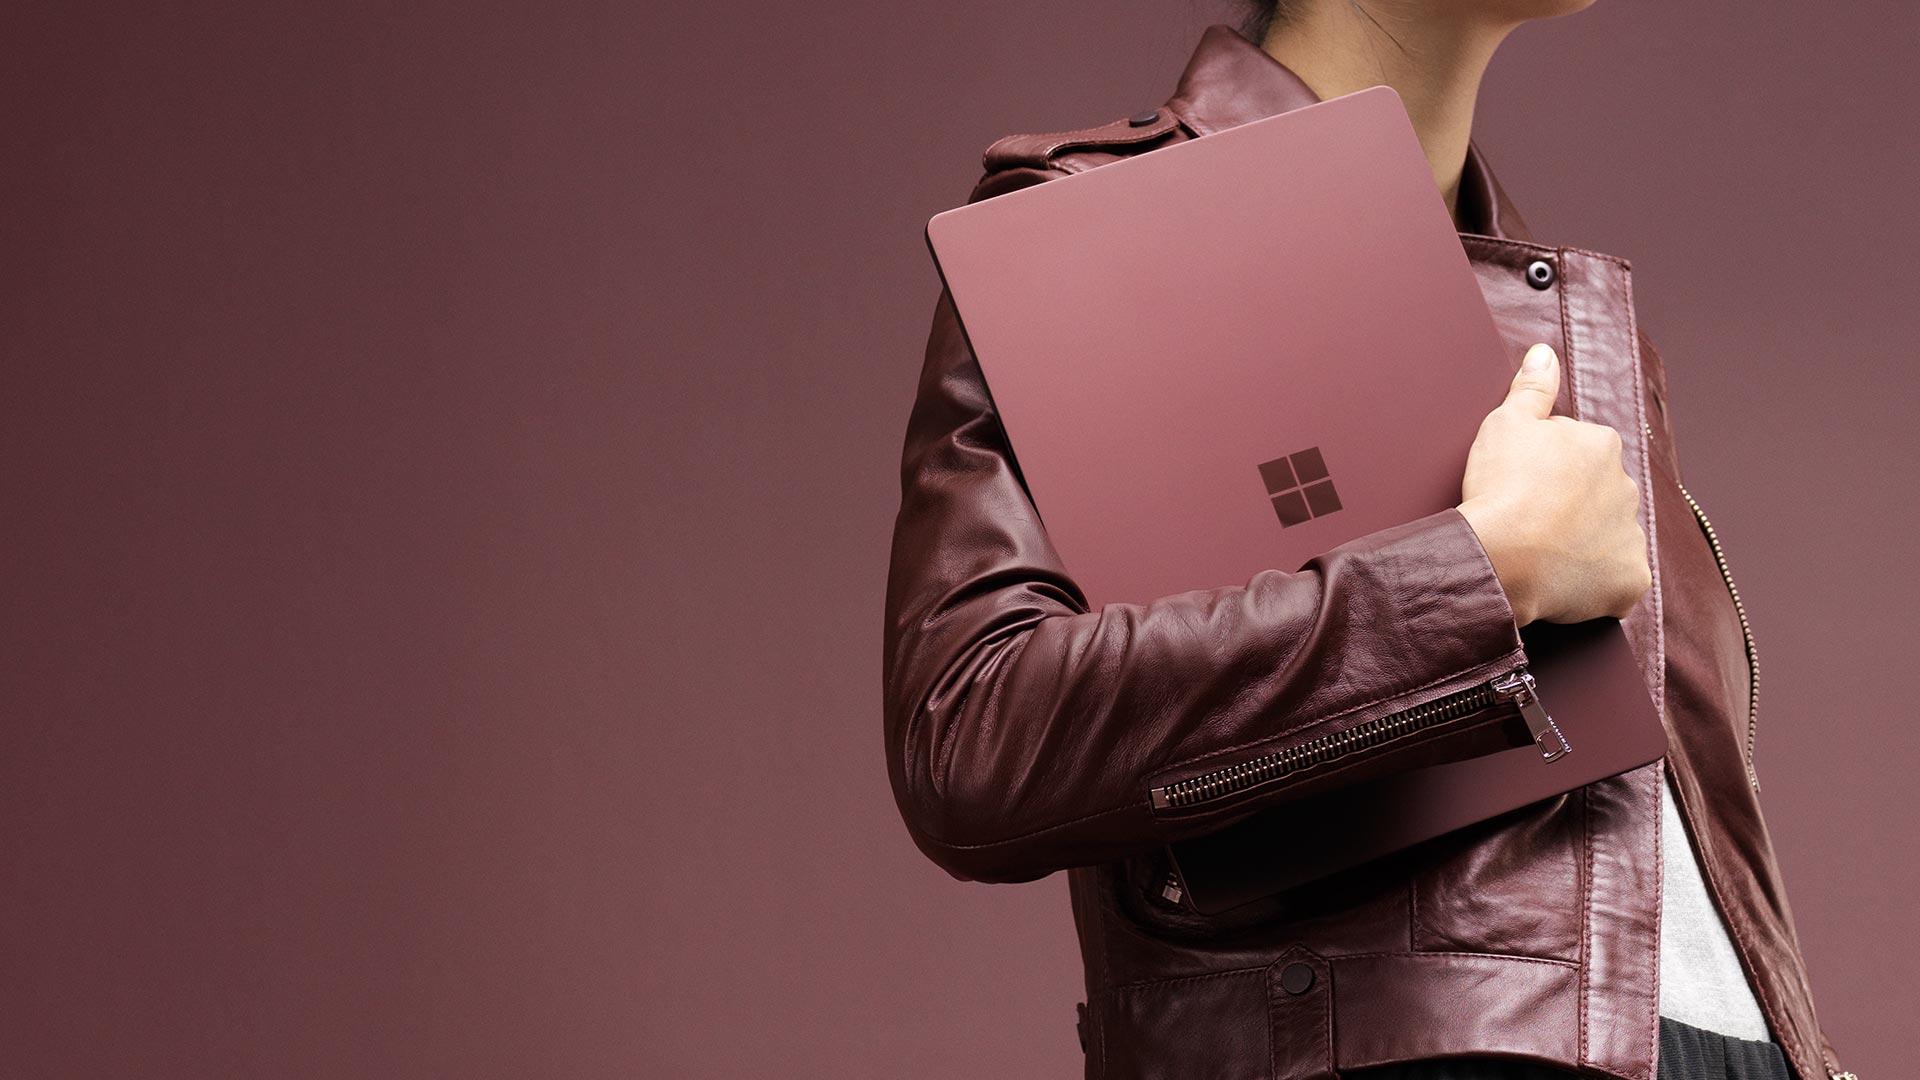 Frau mit Surface Laptop in Bordeaux Rot